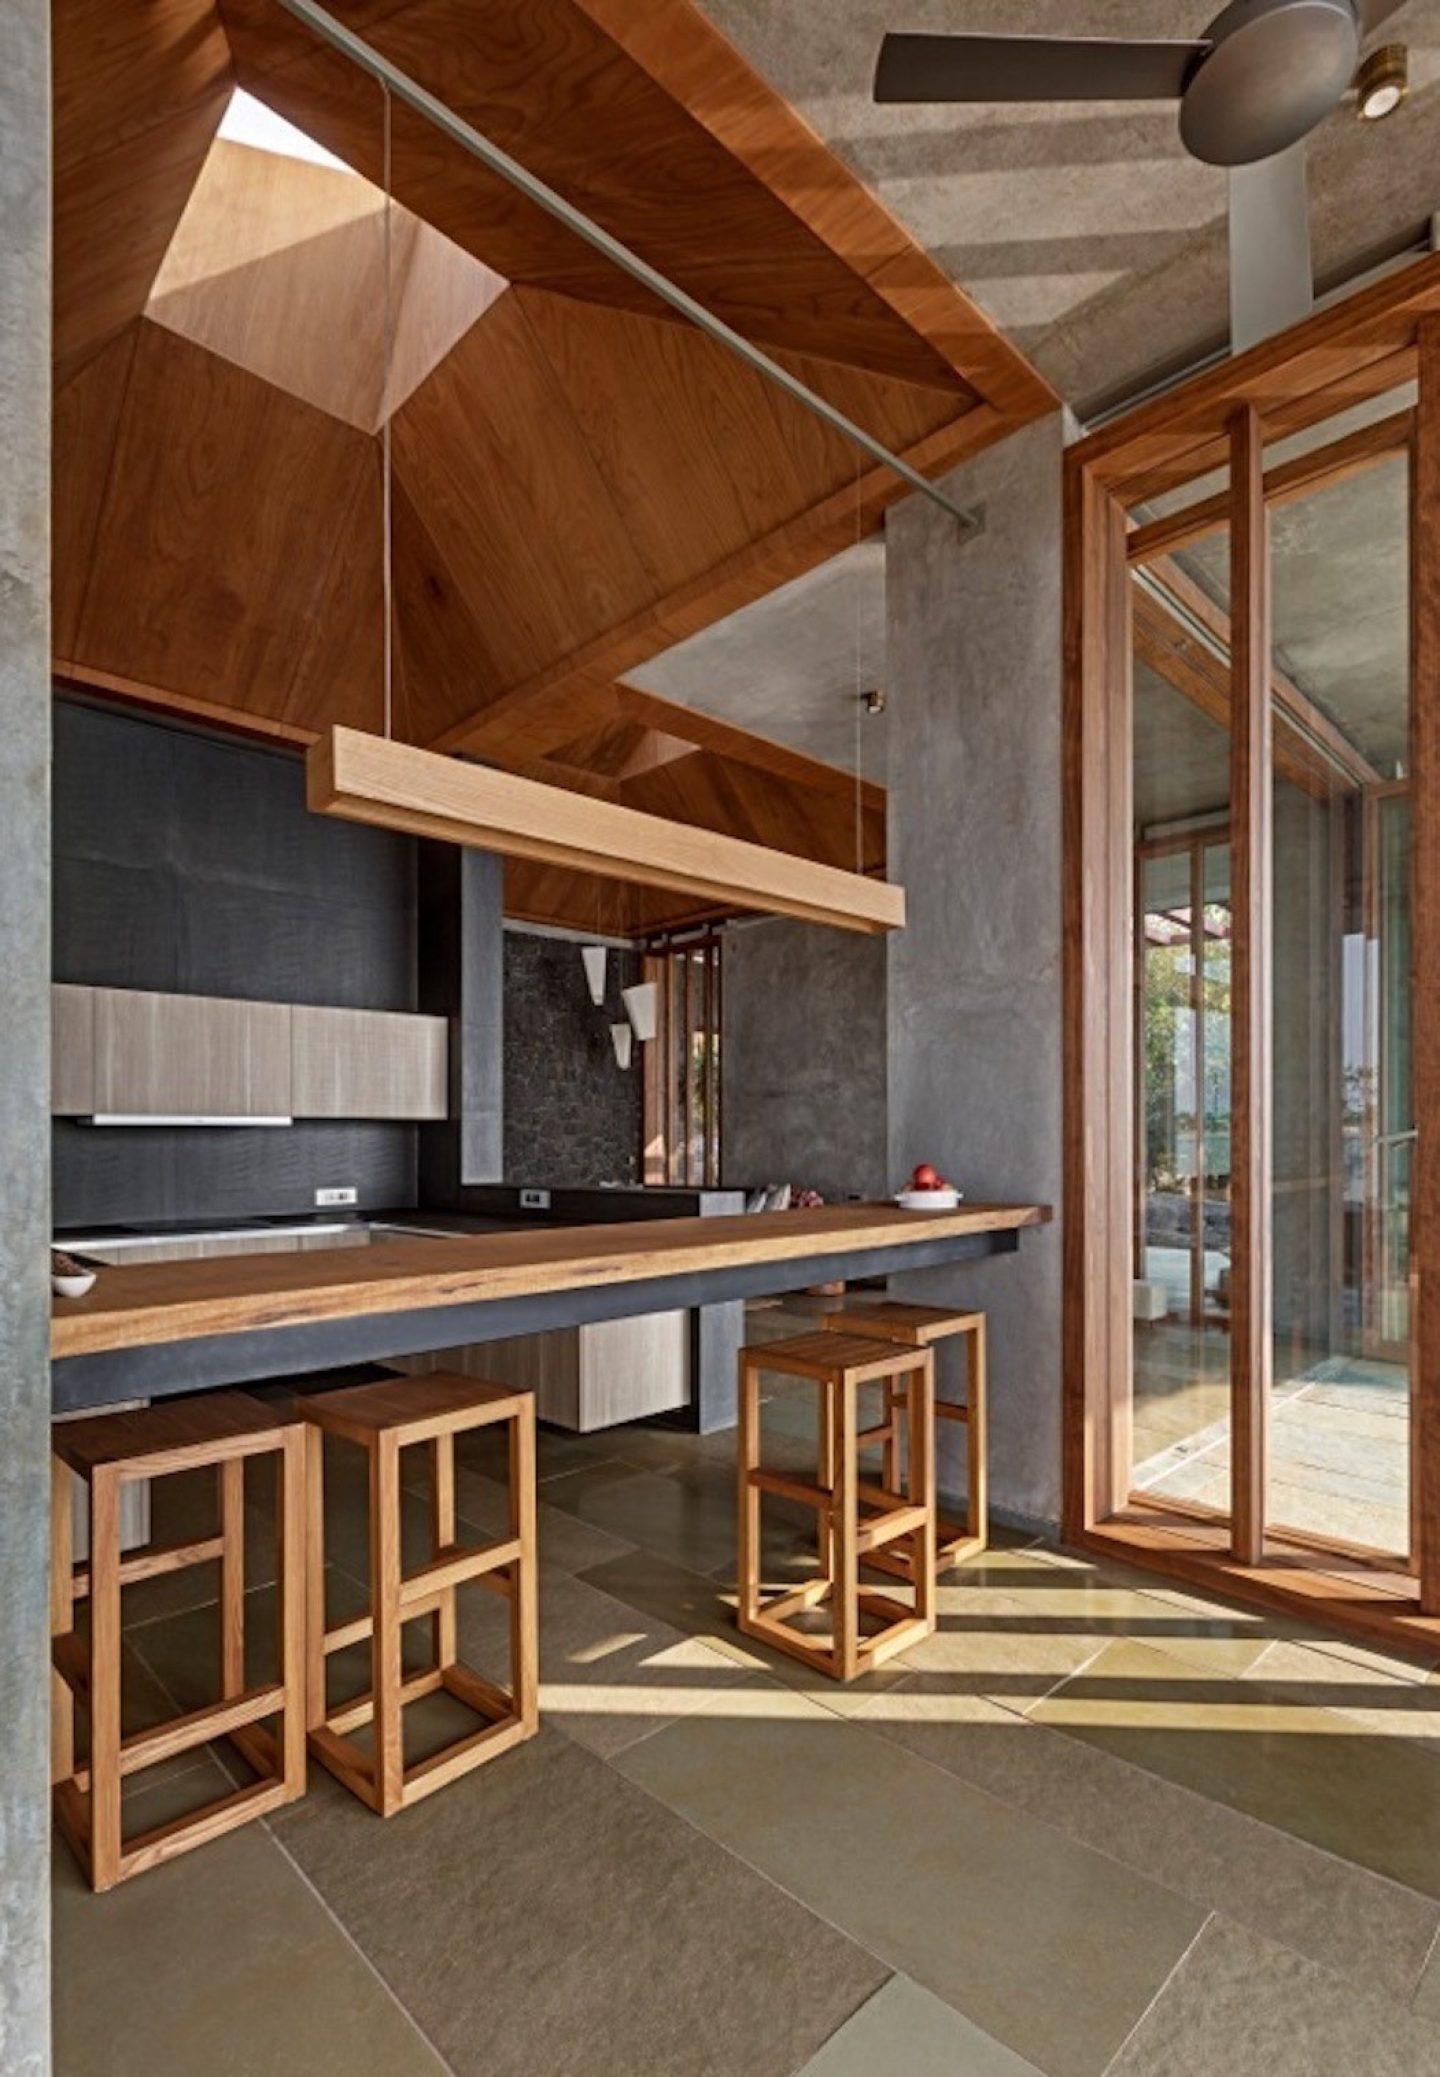 ignant_architecture_khosla_retreat_007